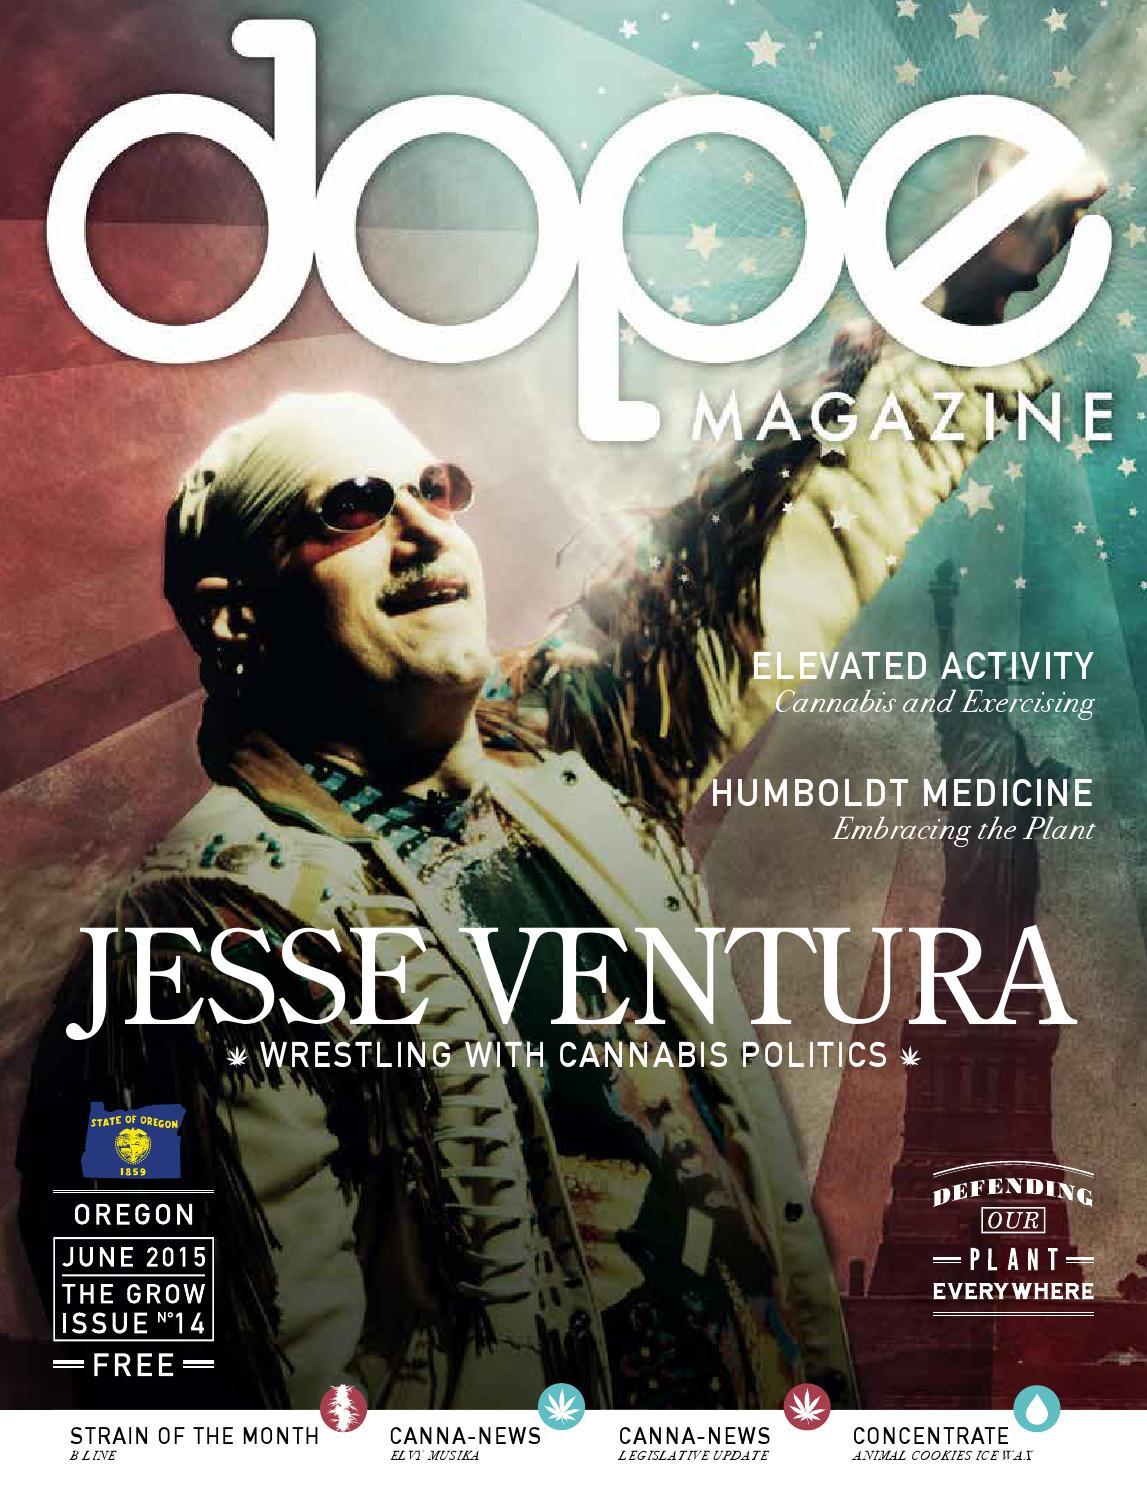 Or dope mag june 2015 web by DOPE Magazine - issuu dedacd41f